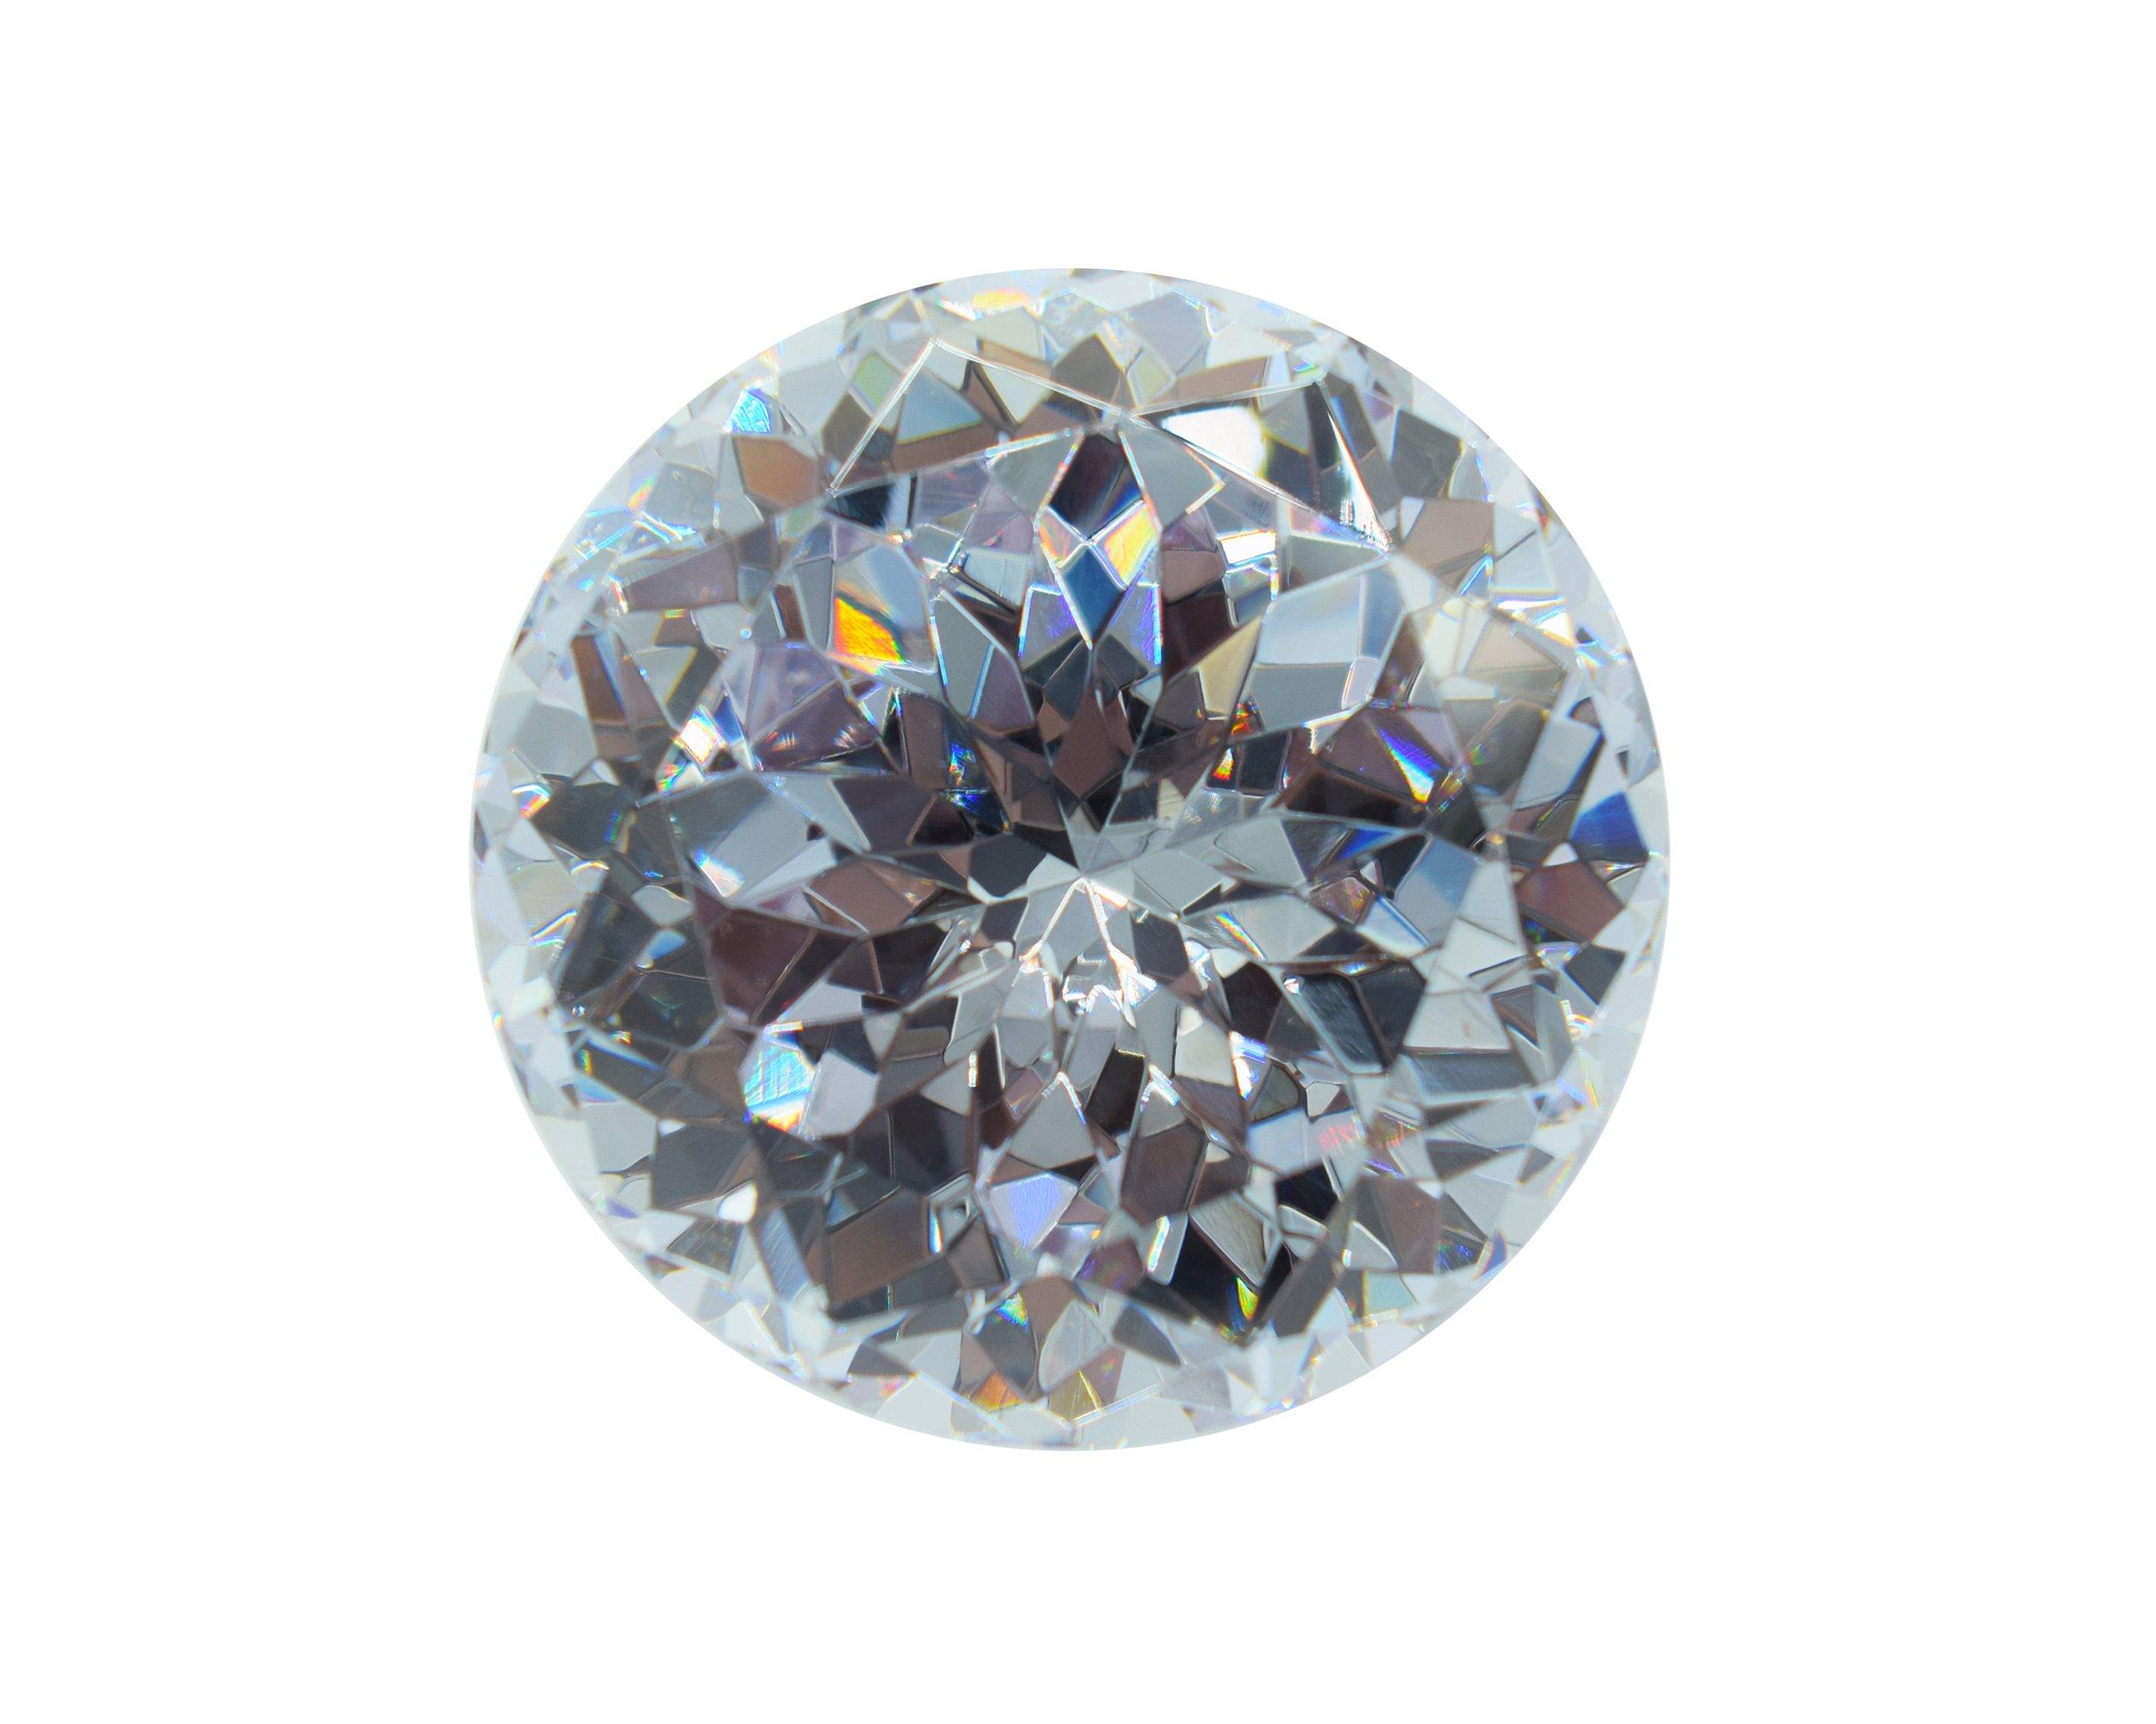 Alone Moon Round Whtie Loose Cubic Zirconia Giant diamond big loose gemstones 30mm-100mm